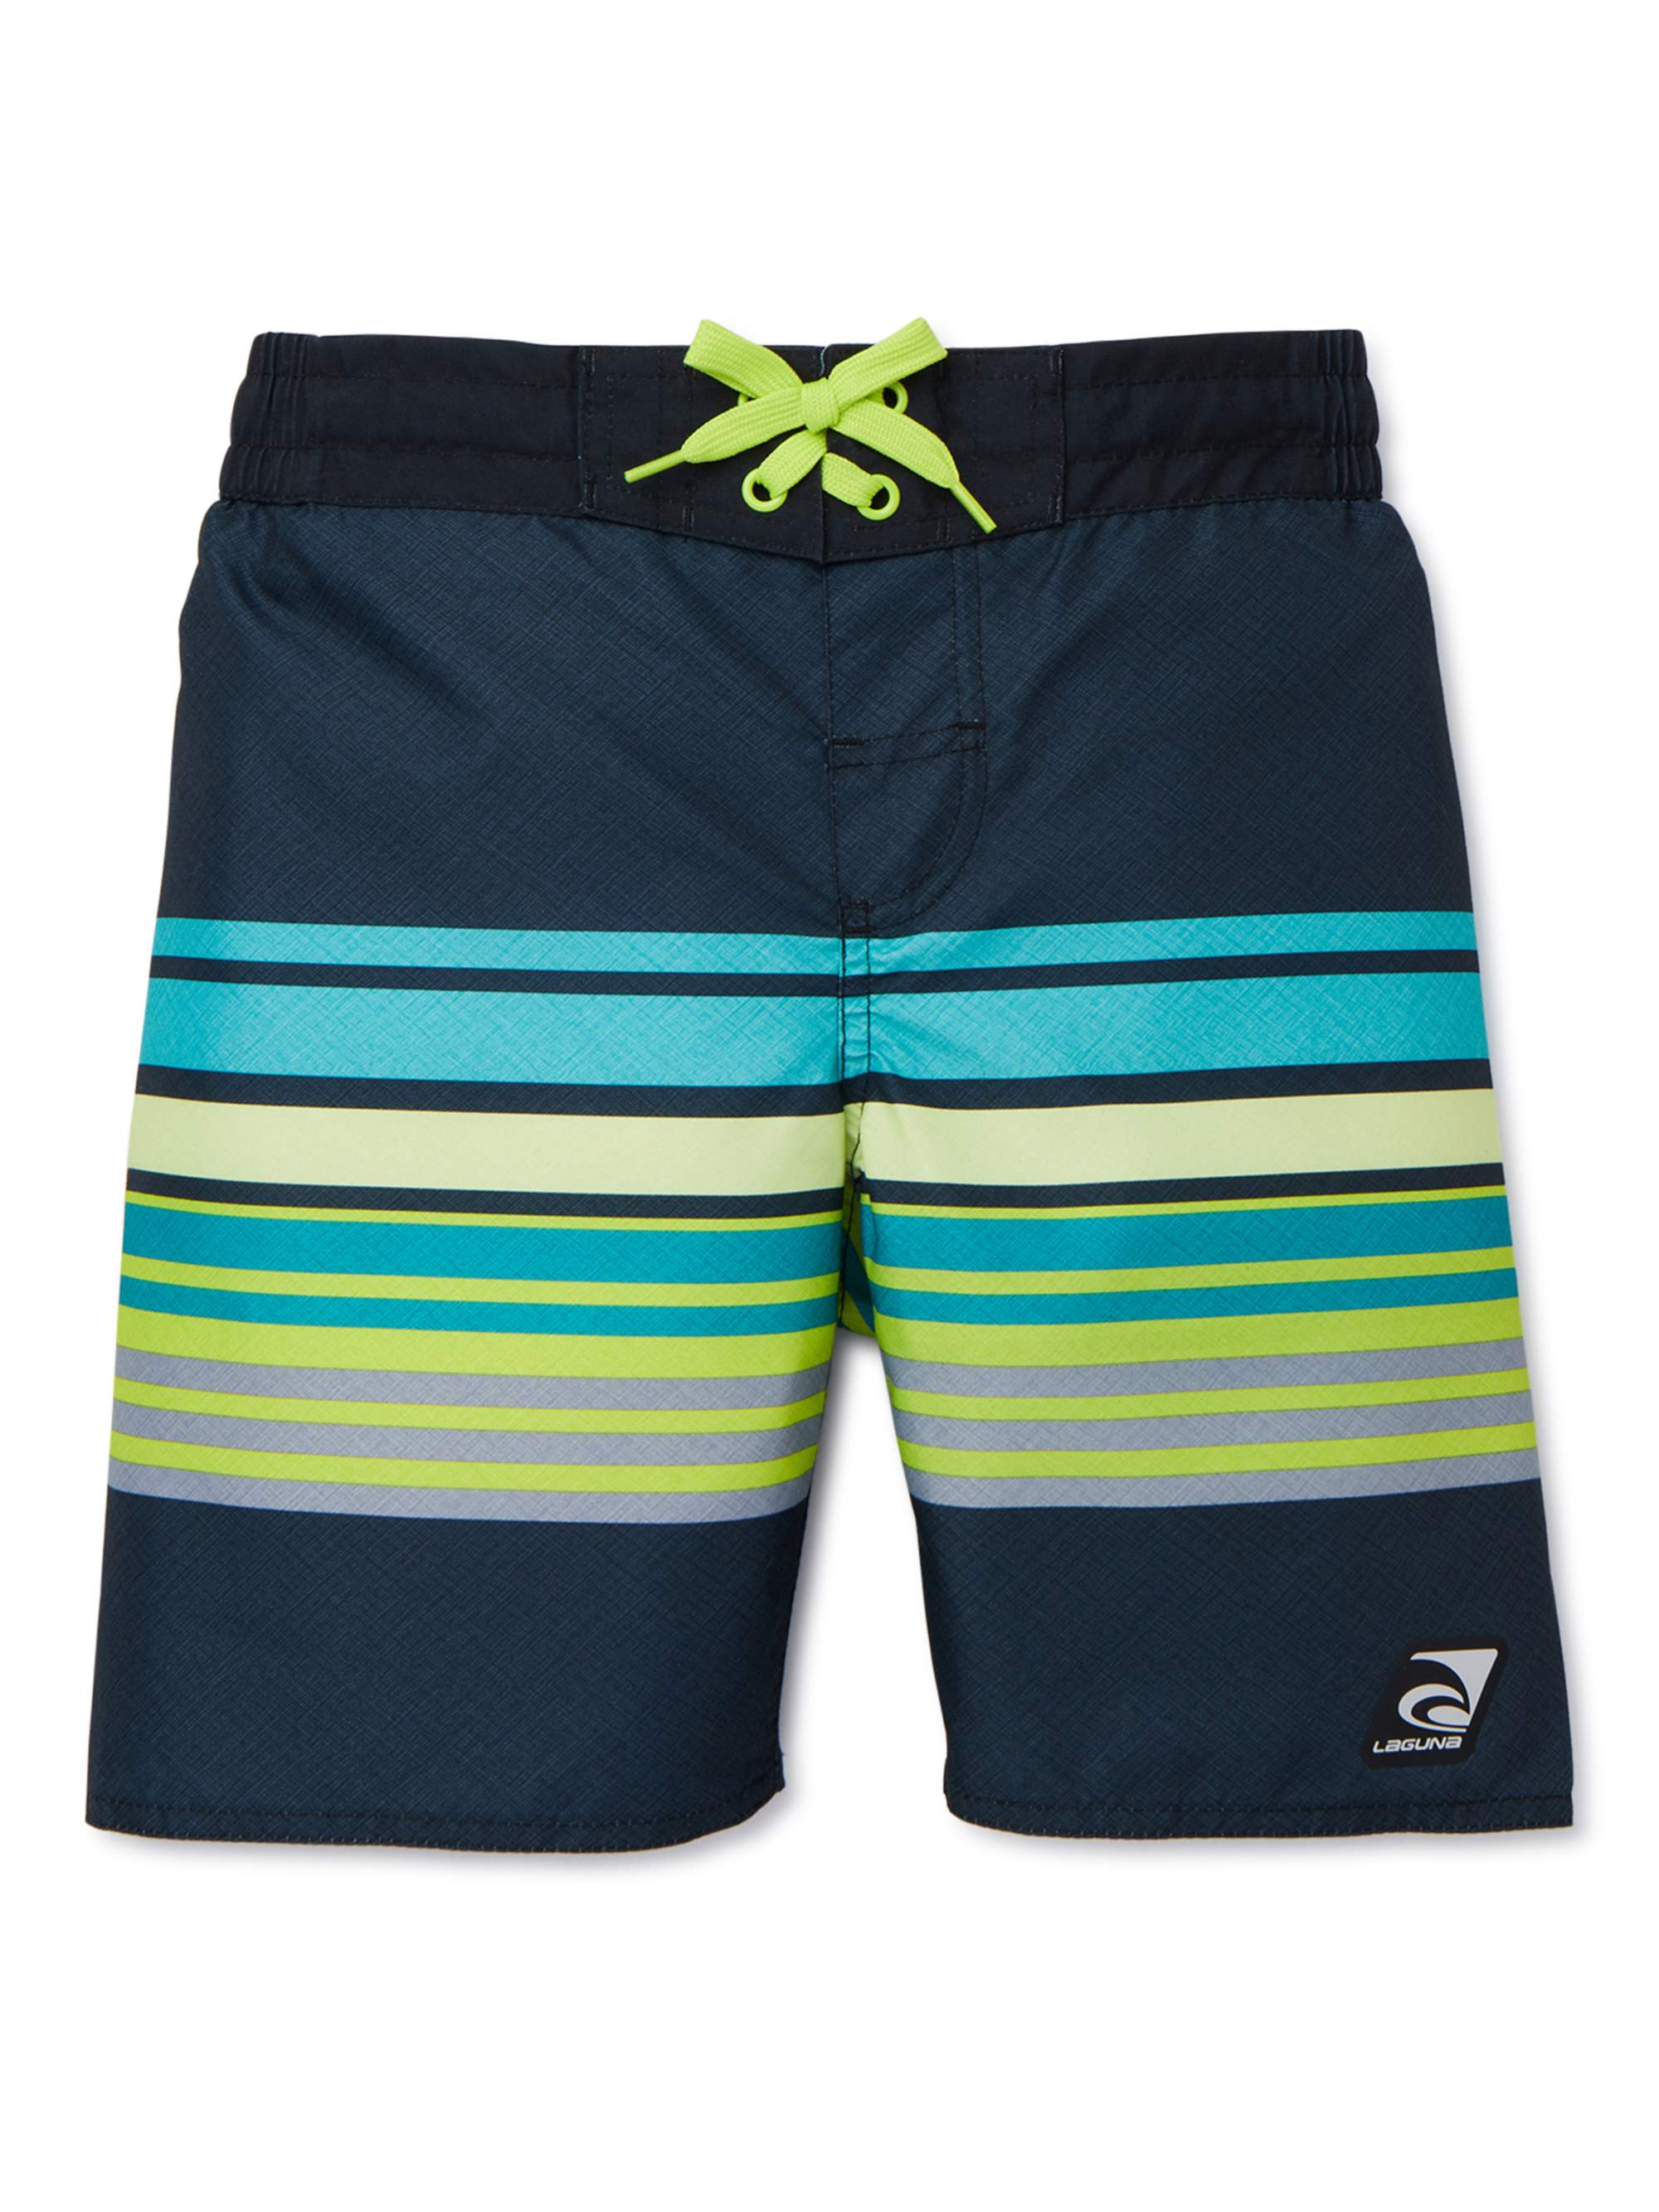 boys swim trunks shorts /& sunglasses /& 2 caps  ~ 12 months ~  UPF 50 swim